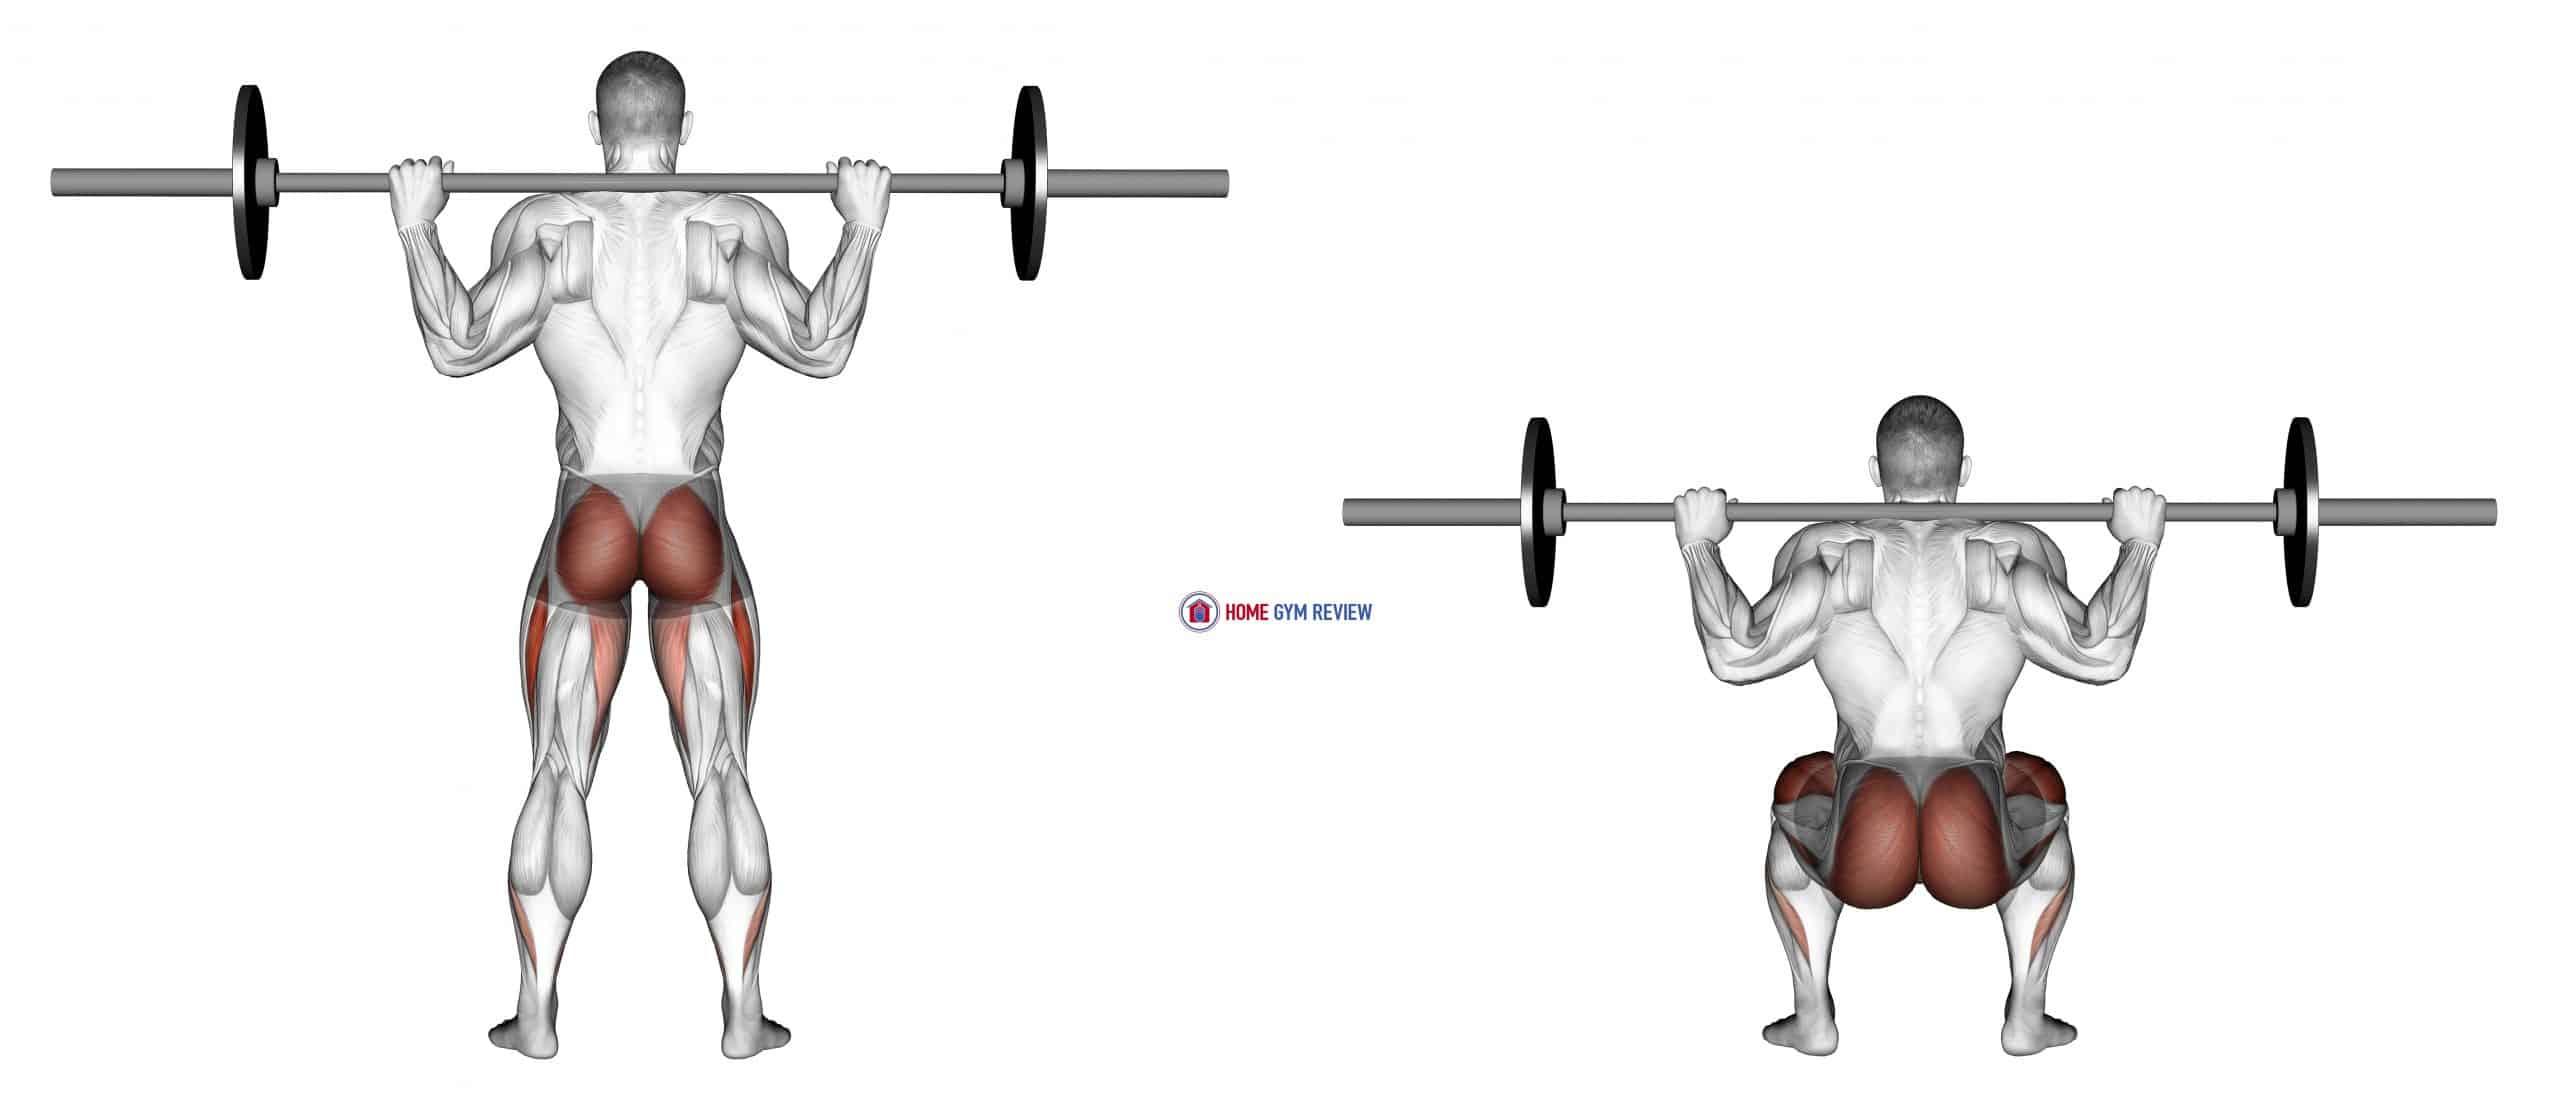 Barbell Full Squat (Back POV)